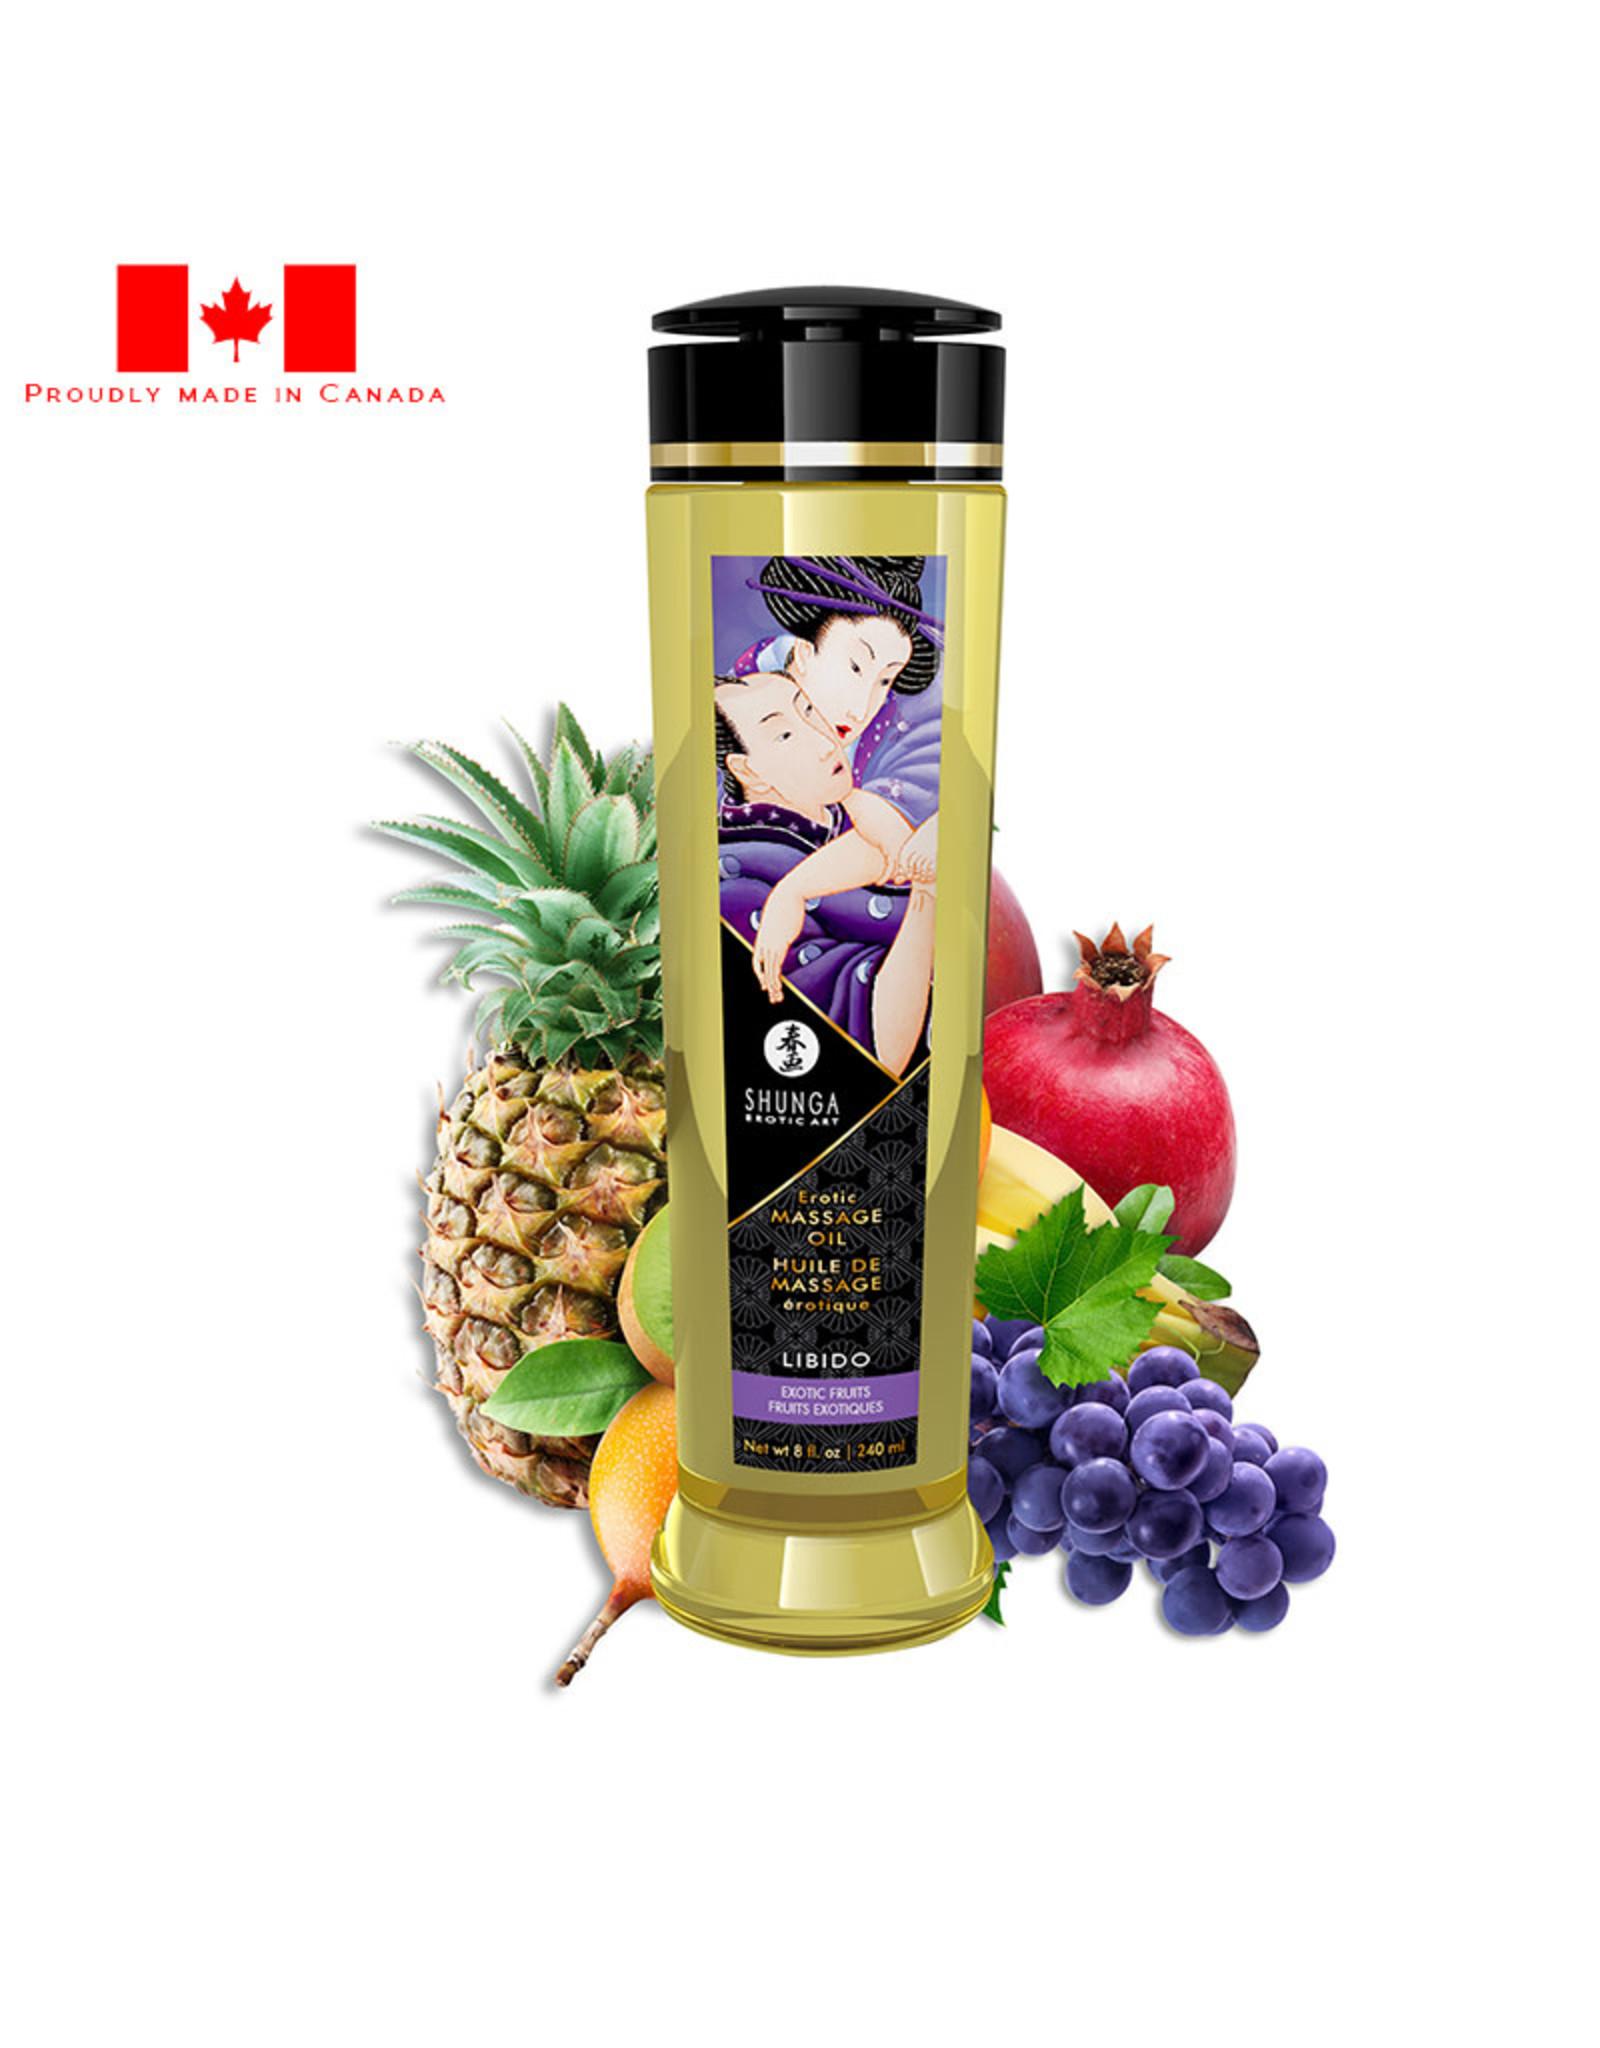 Shunga Shunga - Erotic Massage Oil - Libido - Exotic Fruits